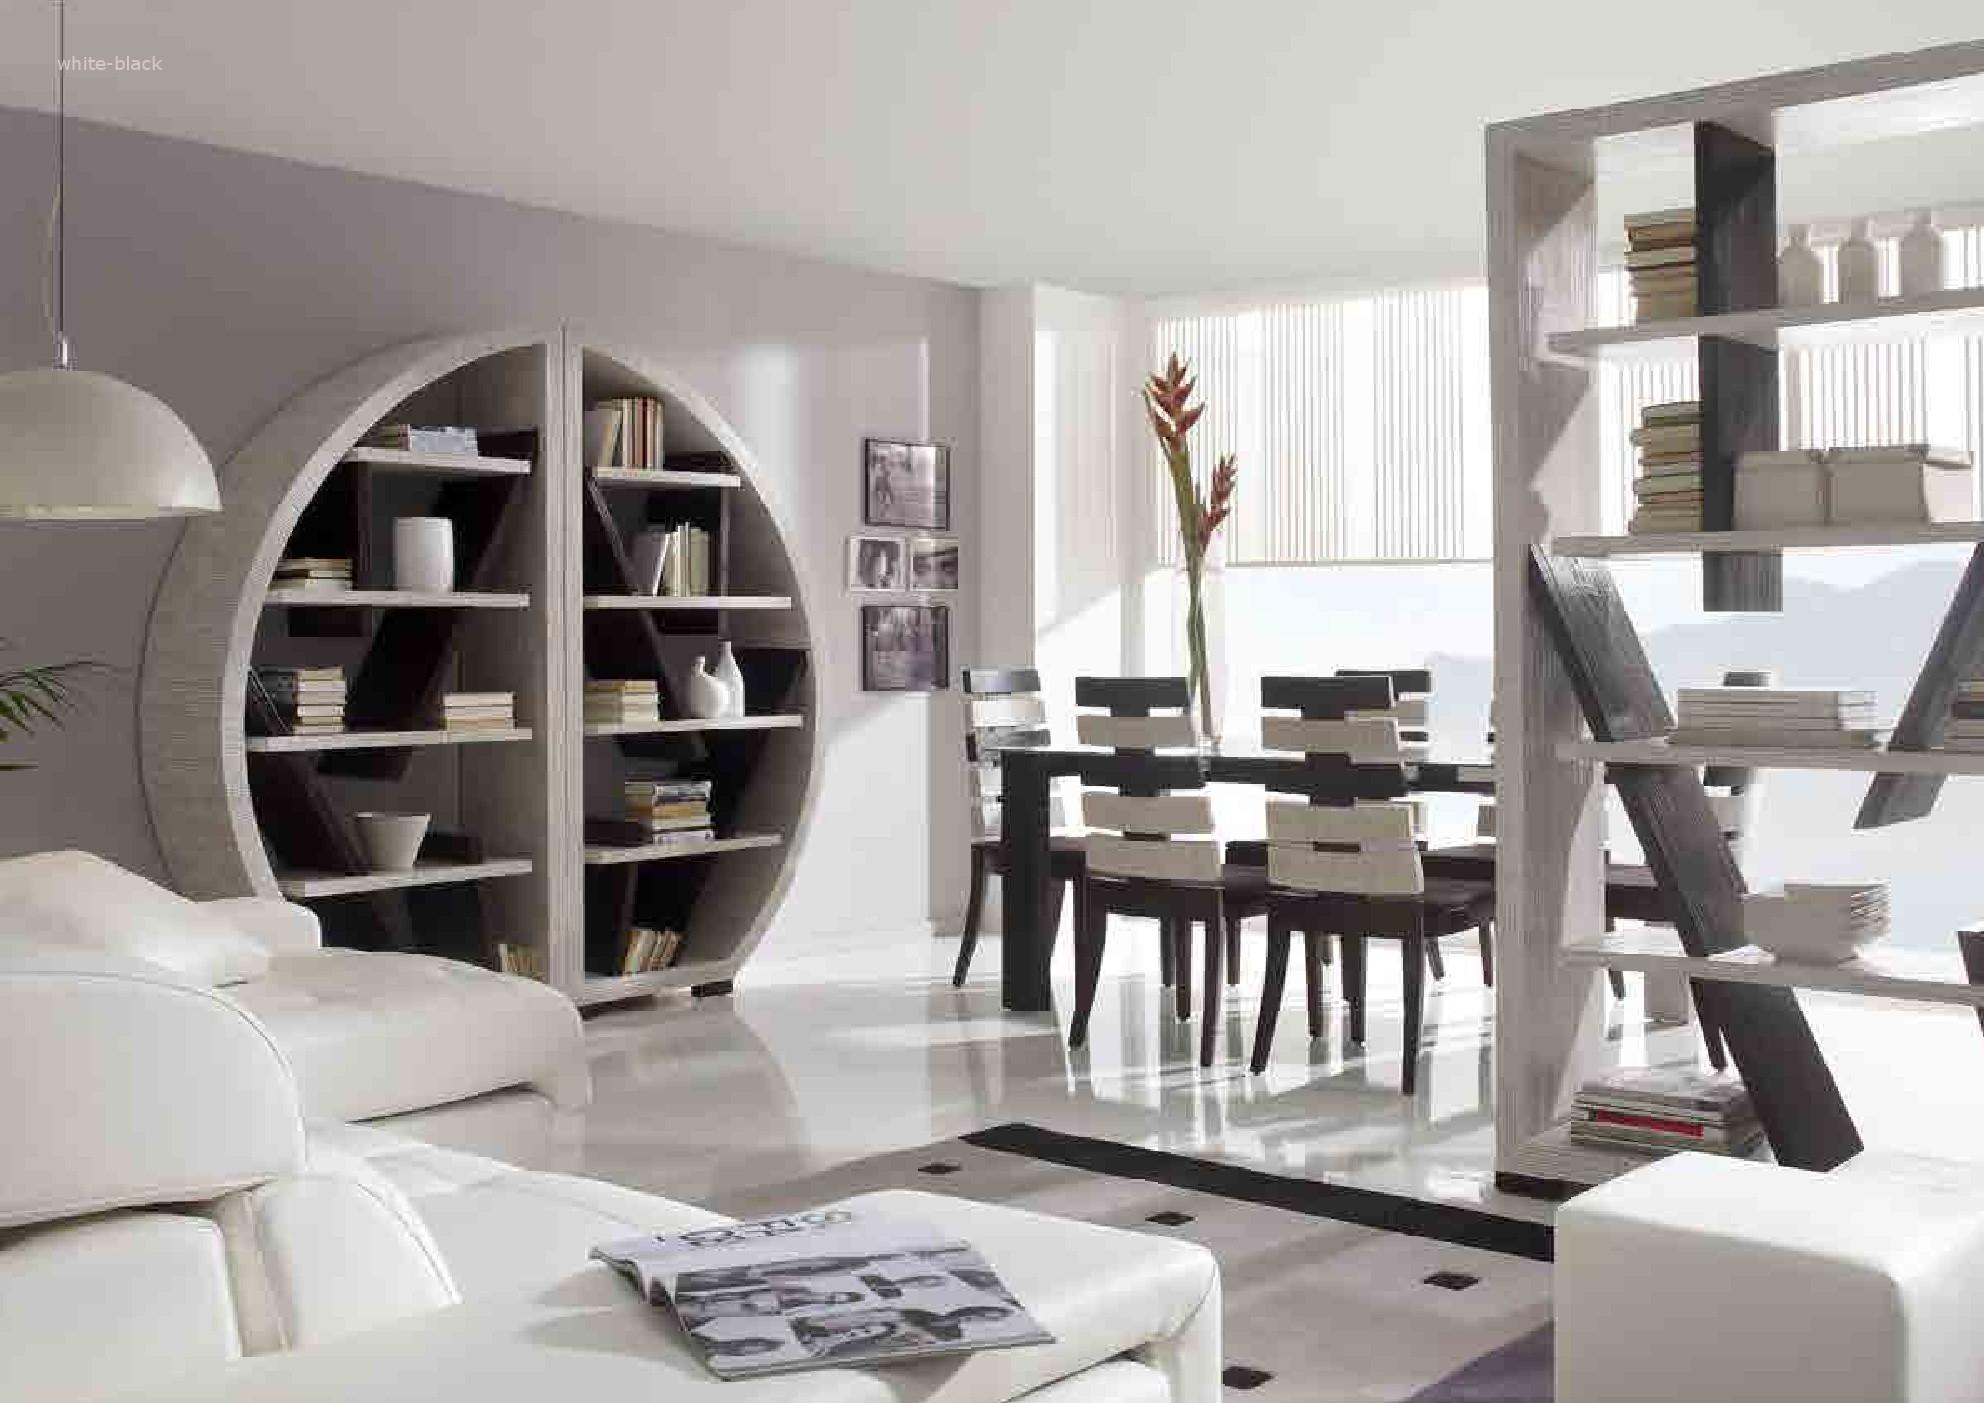 Emejing Soggiorni Completi Gallery - Modern Home Design - orangetech.us